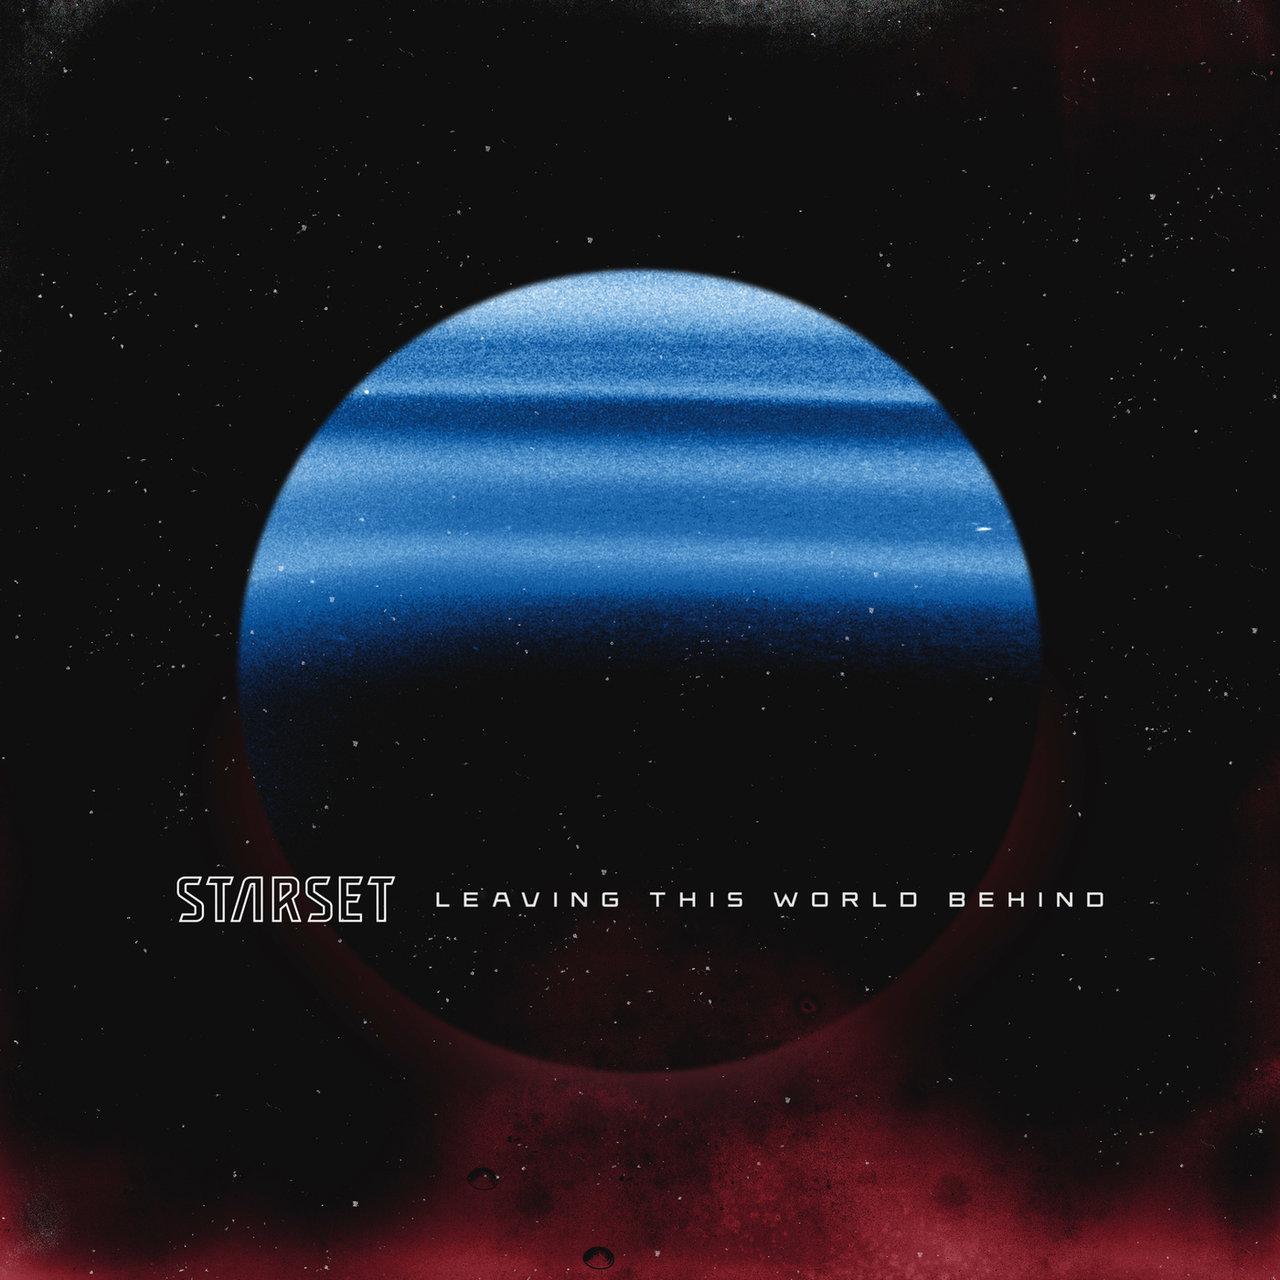 STARSET - LEAVING THIS WORLD BEHIND [single] (2021)